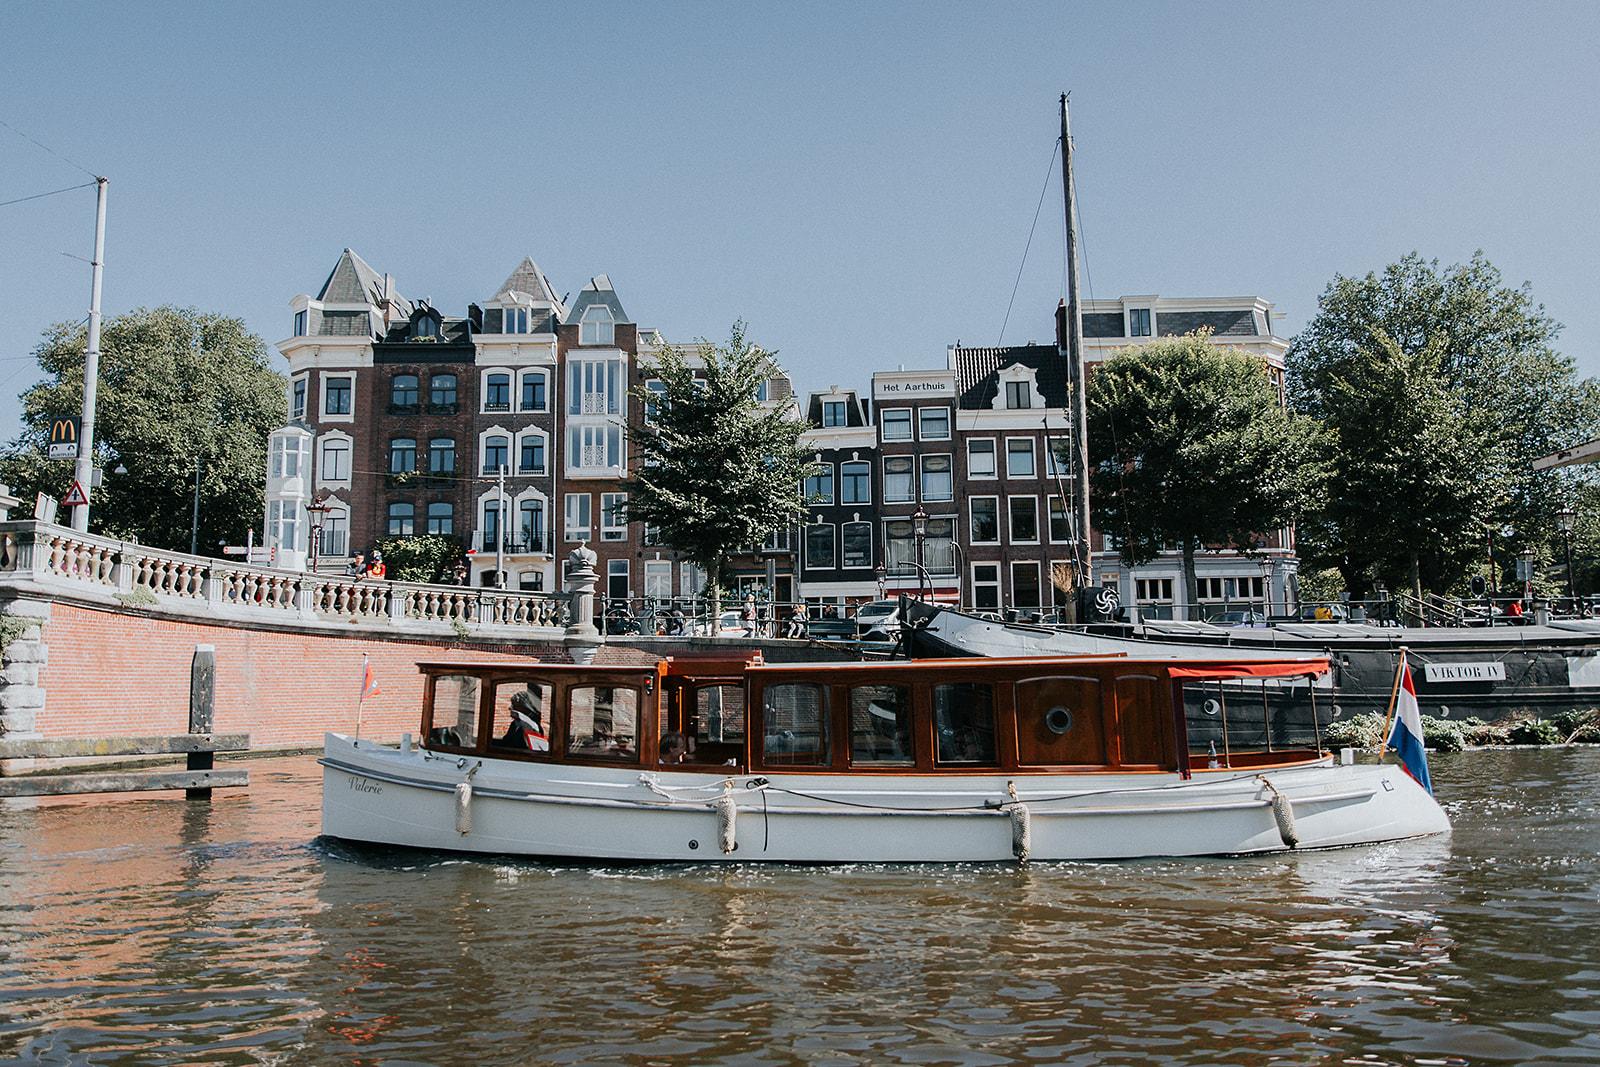 180913_AmsterdamBoothuur-9_websize.jpg